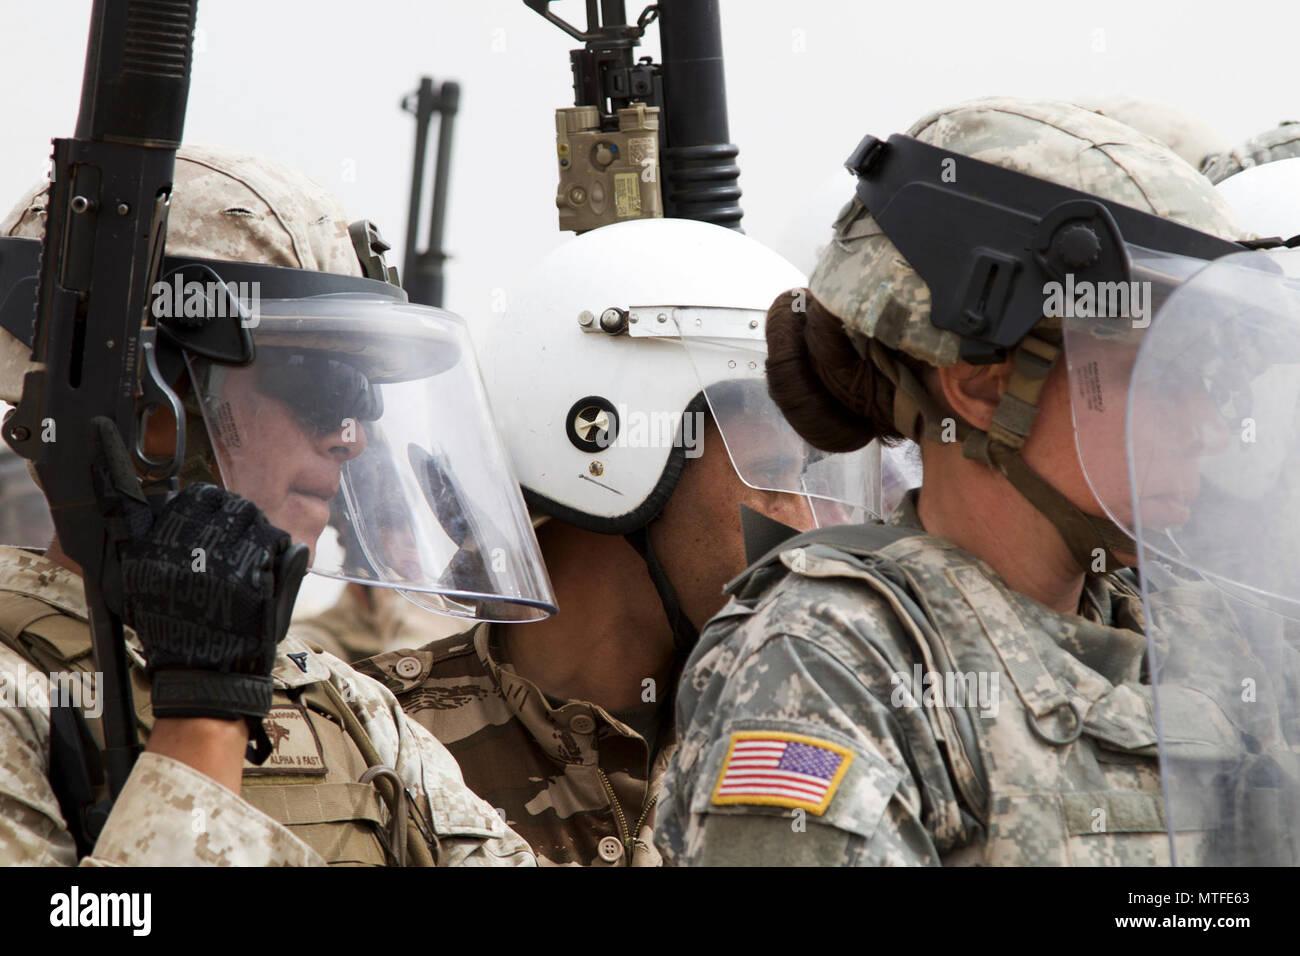 Us Marine Corps Usmc Corporal Cpl Tompkins Military Police Mp Company Uses A Bomb Search Mirror During A Random Vehicle Inspection Marine Corps Base Mcb Camp Lejeune North Carolina Picryl Public